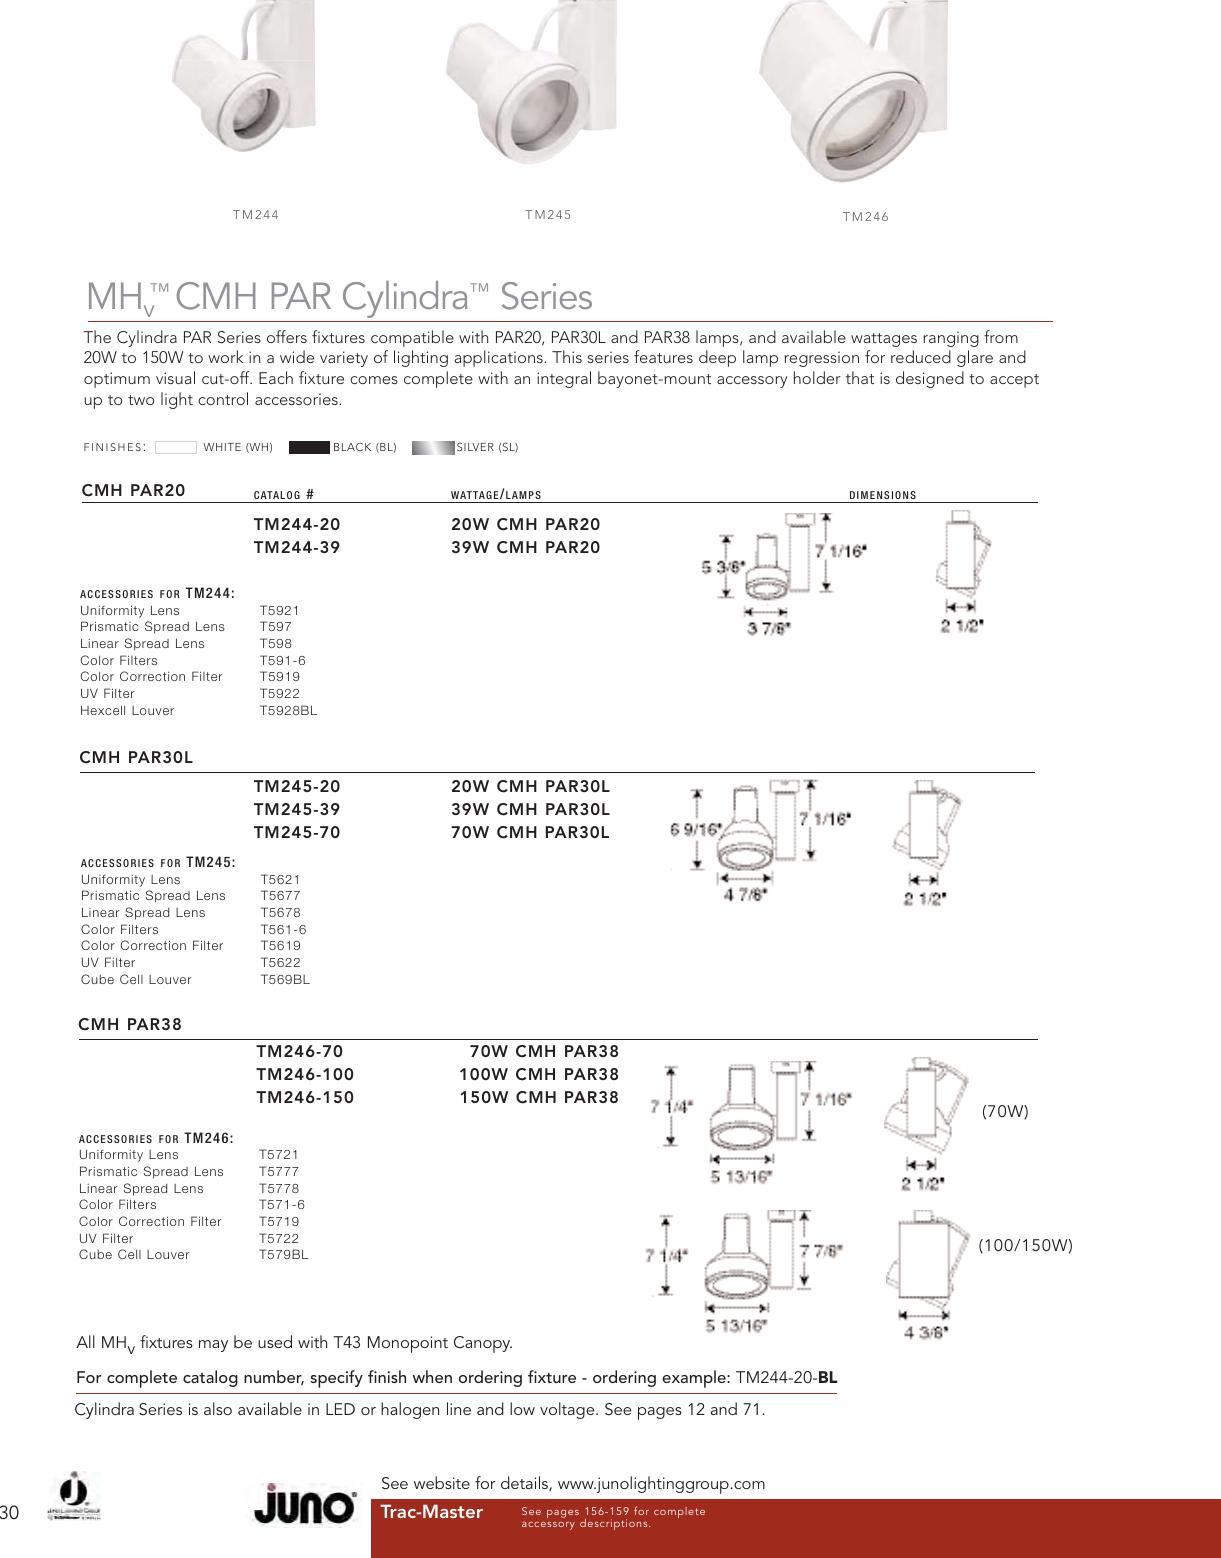 MHv Pro-Gimbal 39W CMH PAR30L Trac Lamp Juno TM203-39EMH-WH